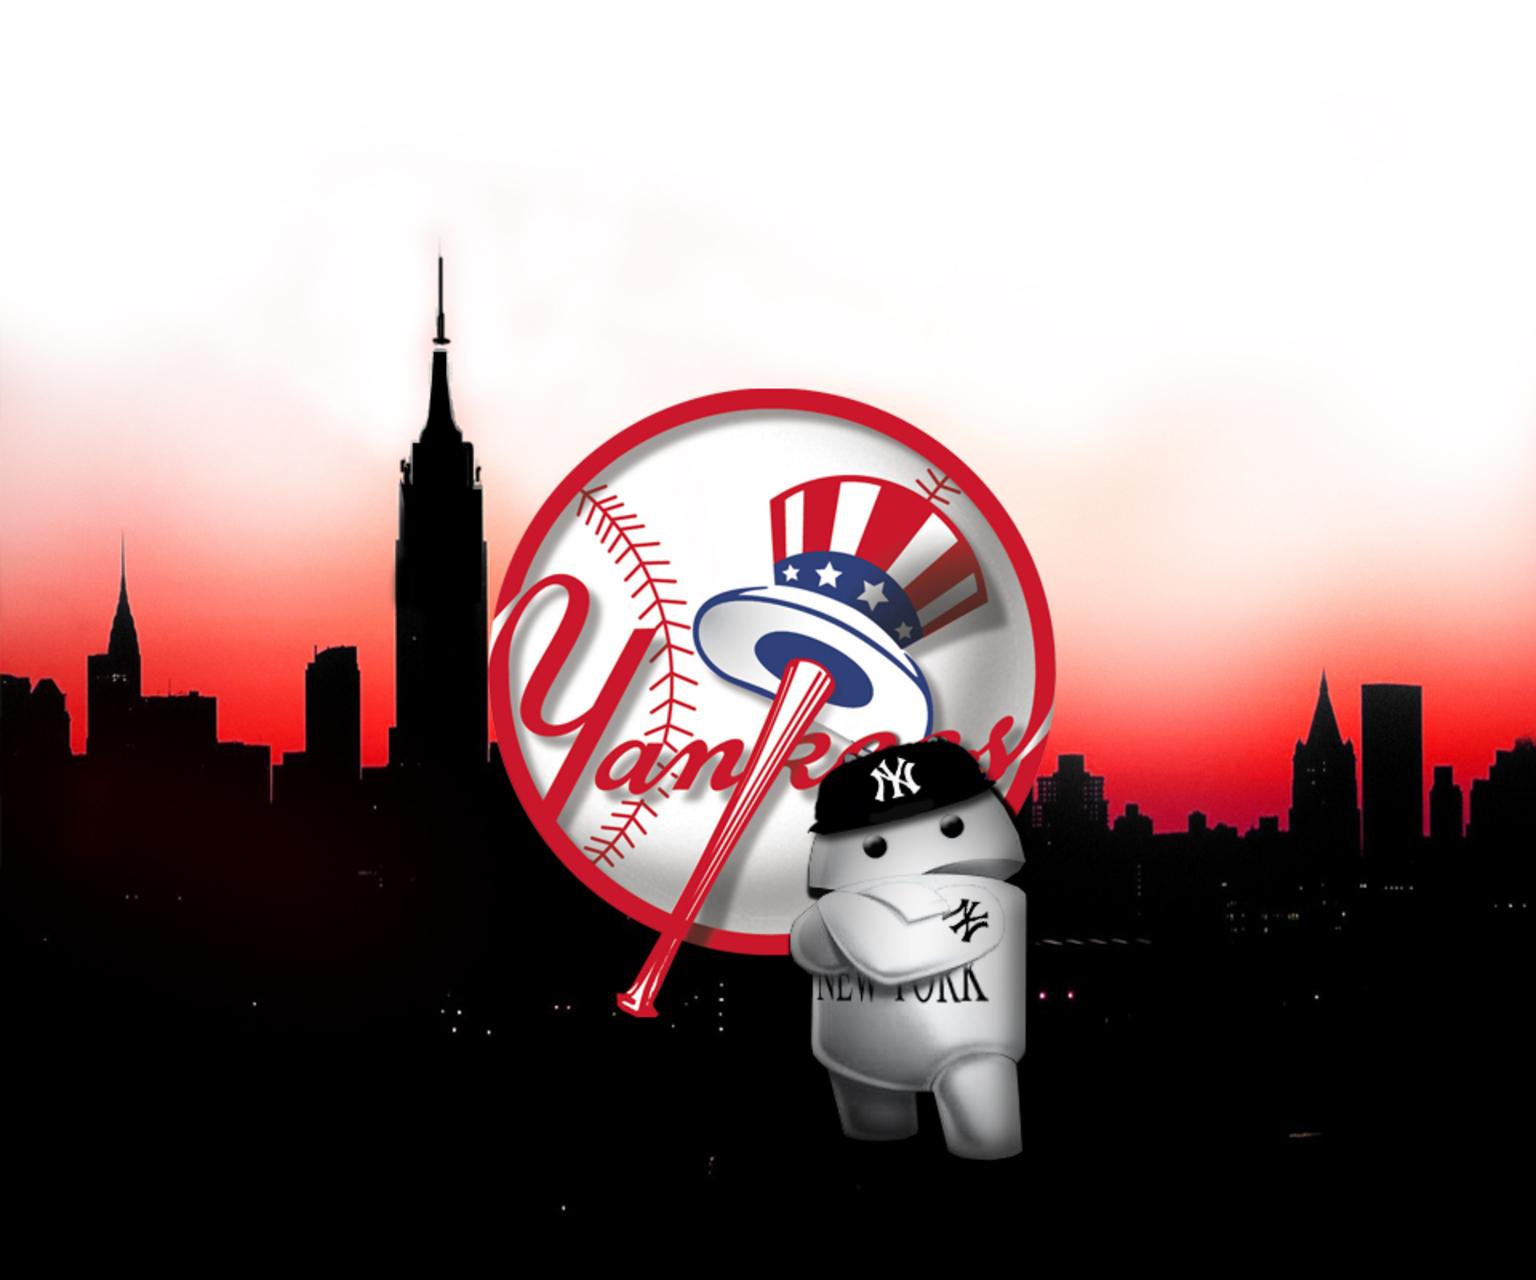 Desktop Wallpaper New: New York Yankees Desktop Wallpaper